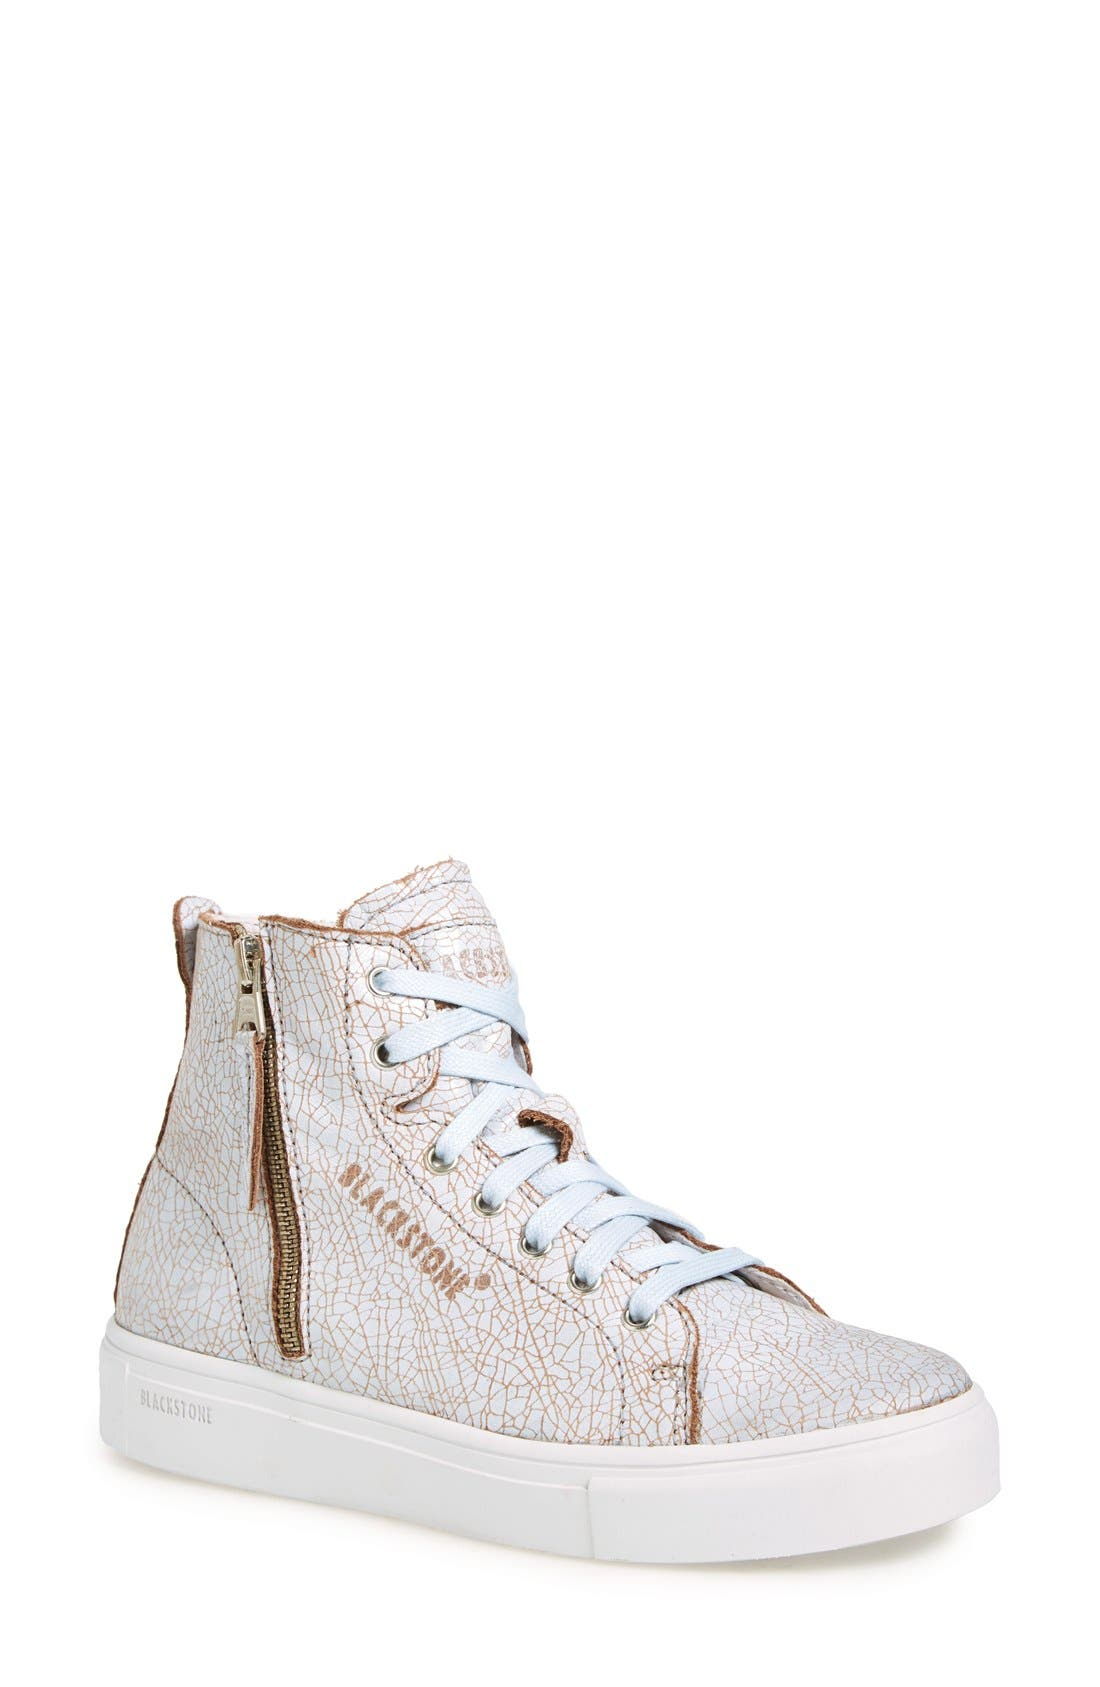 Alternate Image 1 Selected - Blackstone 'LL78' Crackled High Top Platform Sneaker (Women)